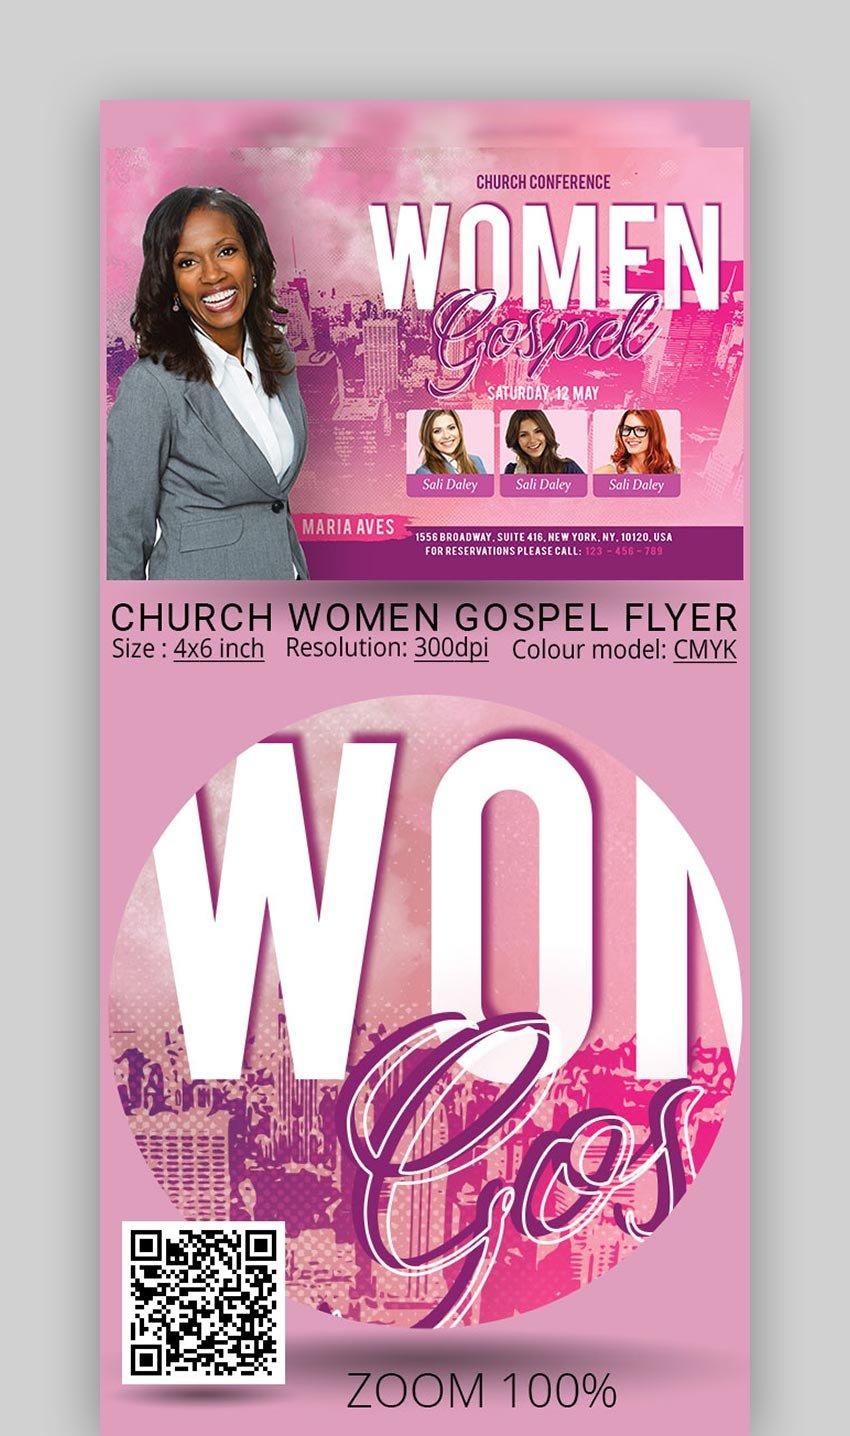 Church Women Gospel Flyer